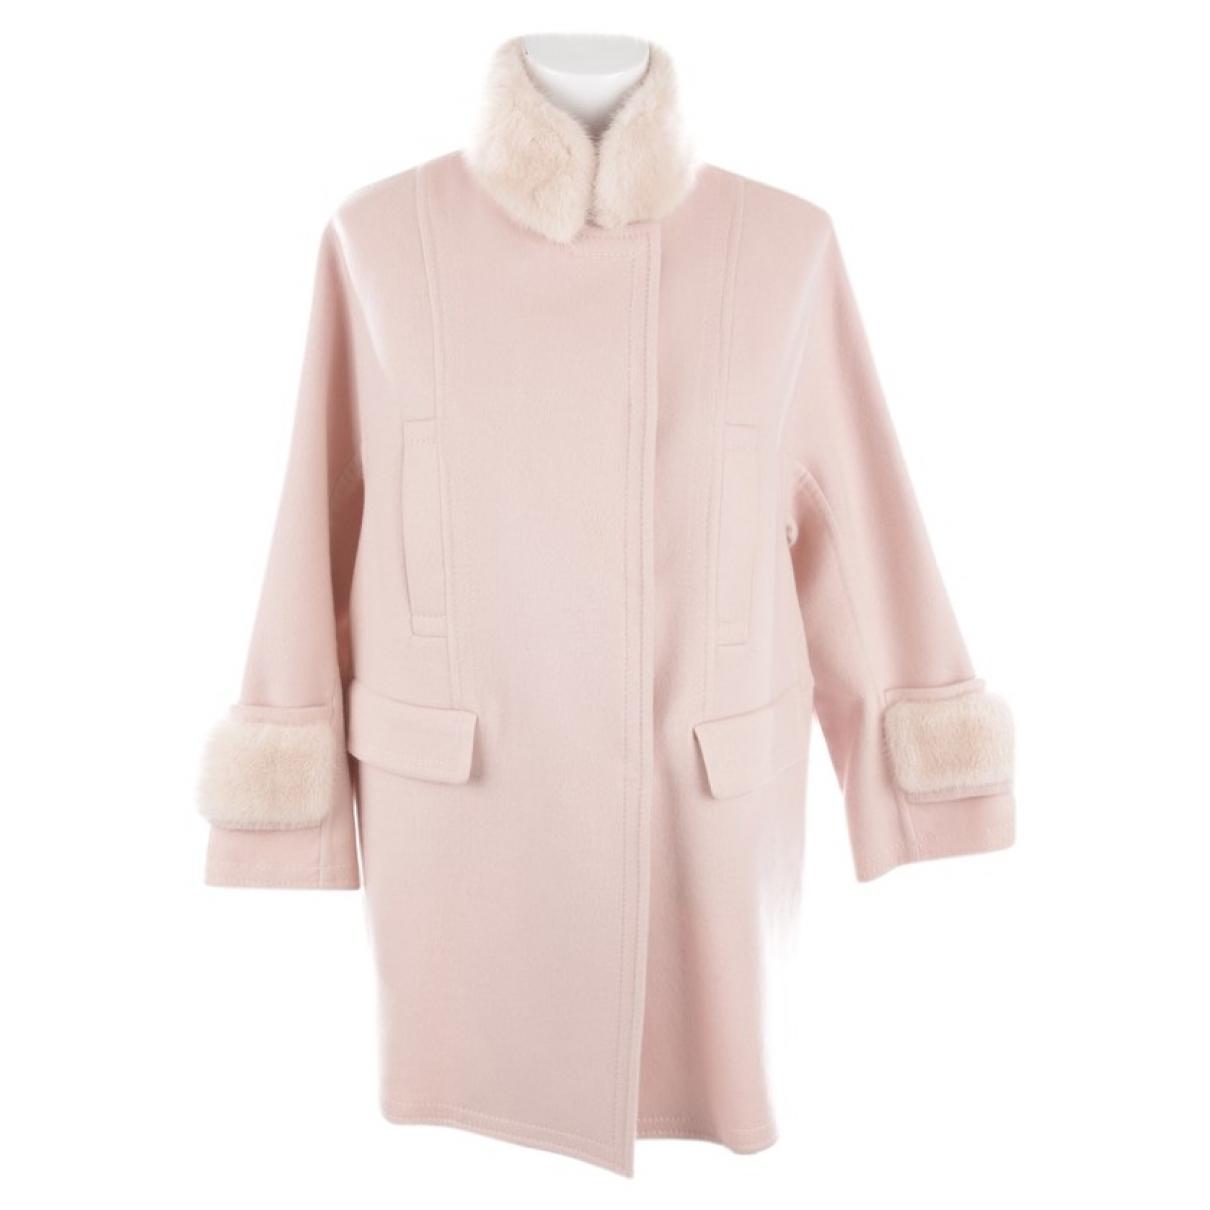 Ermanno Scervino - Veste   pour femme en soie - rose